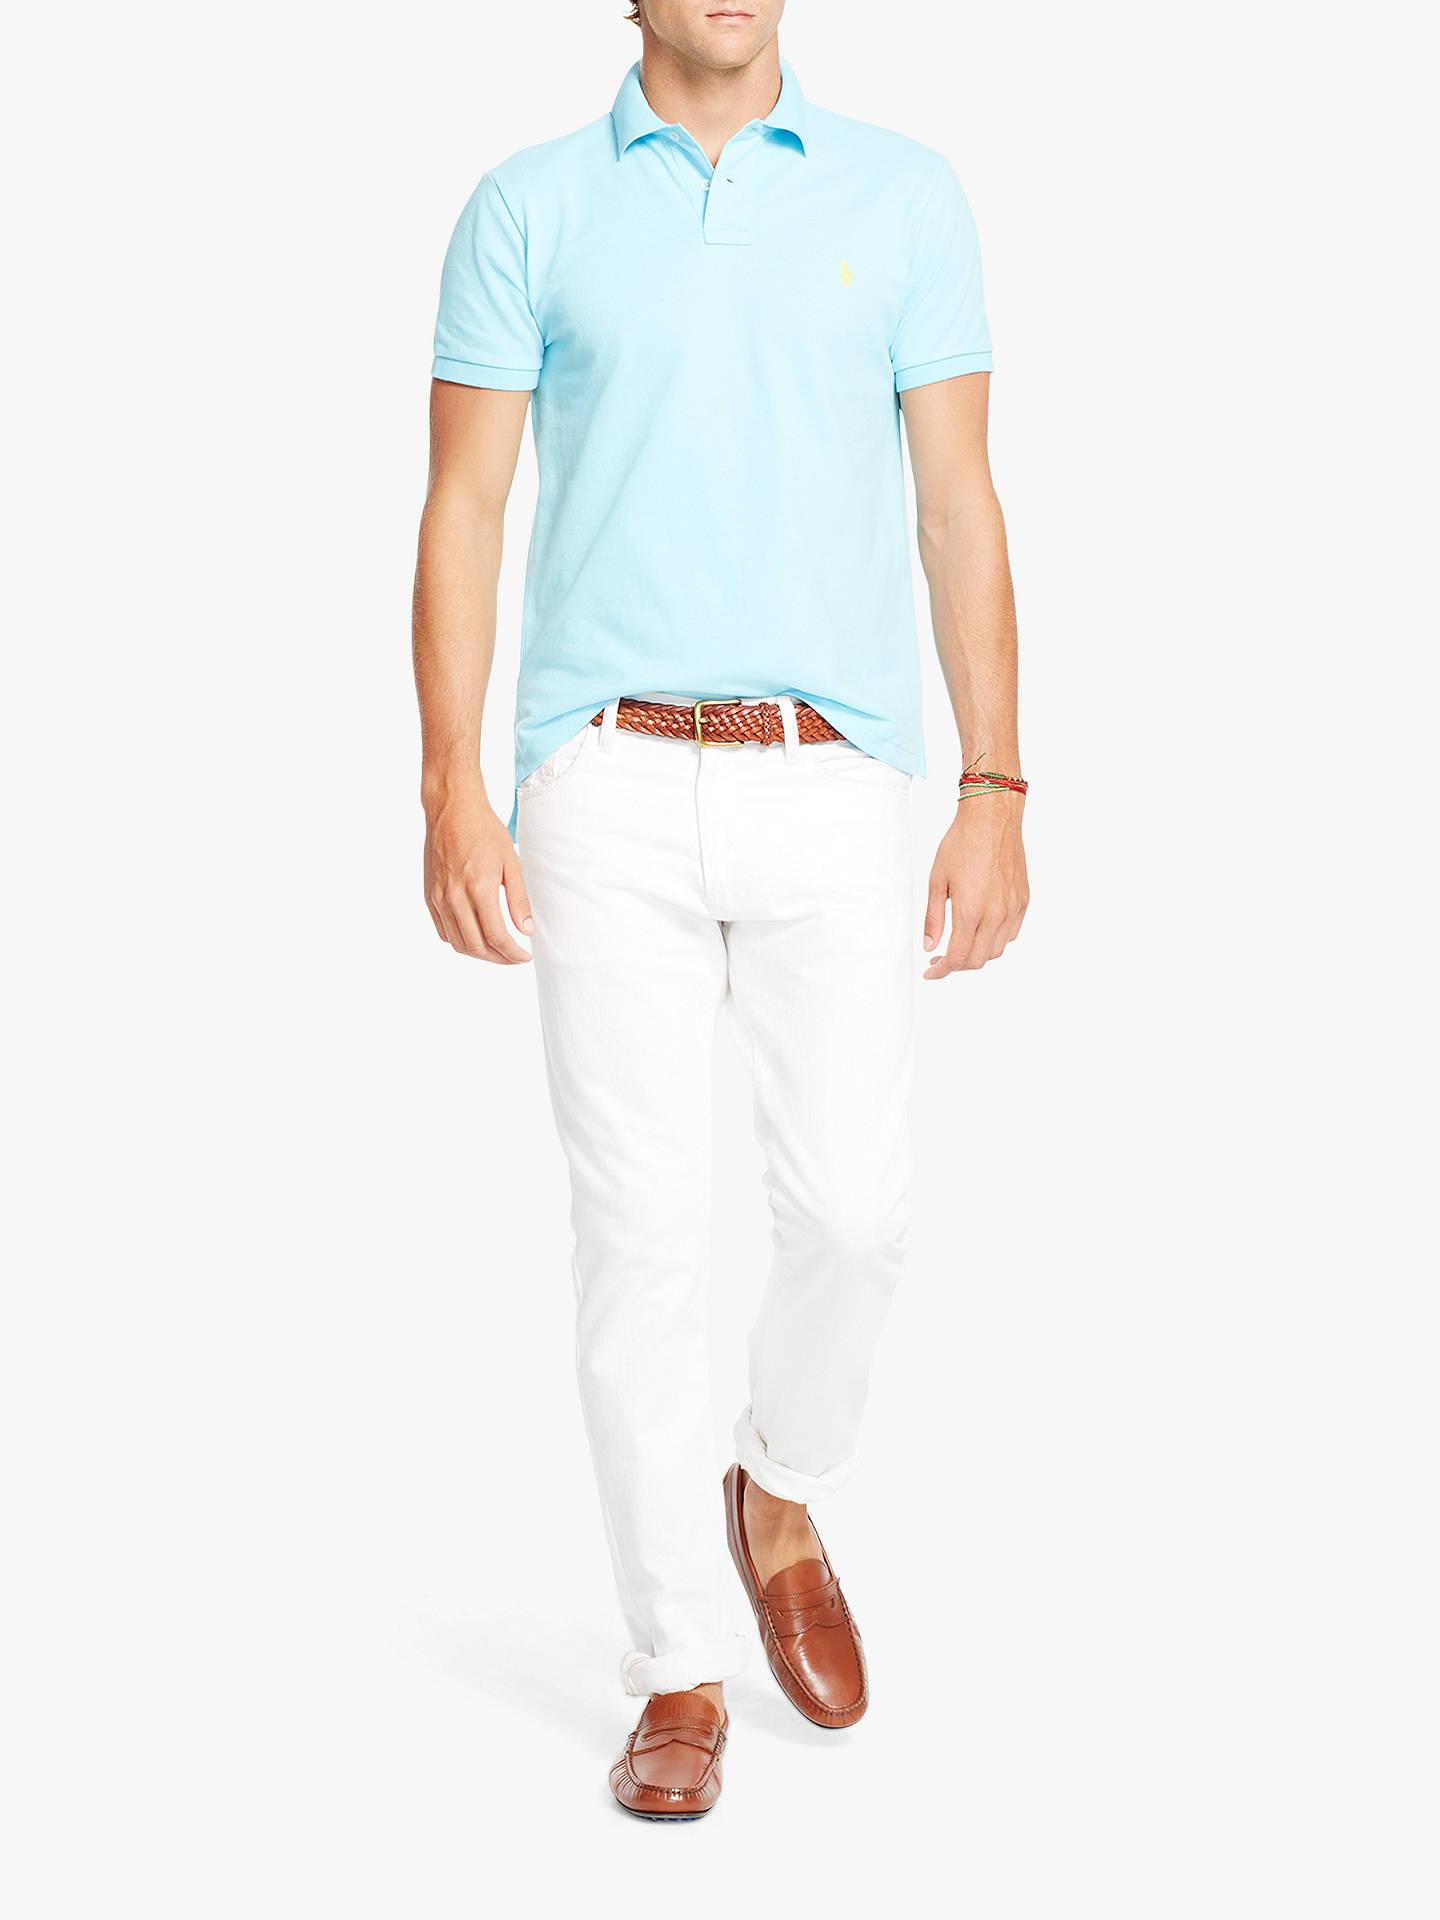 7831a0cf ... Buy Polo Ralph Lauren Short Sleeve Custom Slim Fit Mesh Polo Shirt,  Hammond Blue,